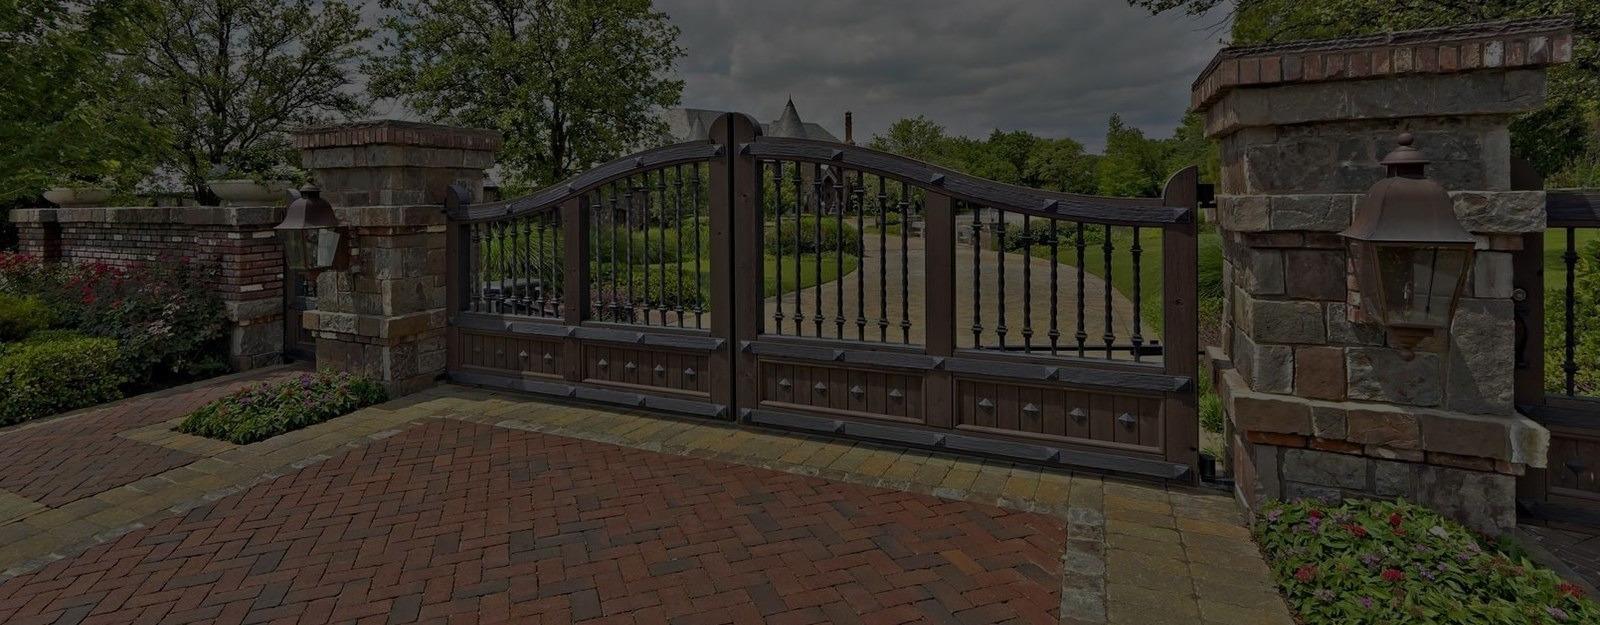 Automatic Gate Repair Park City